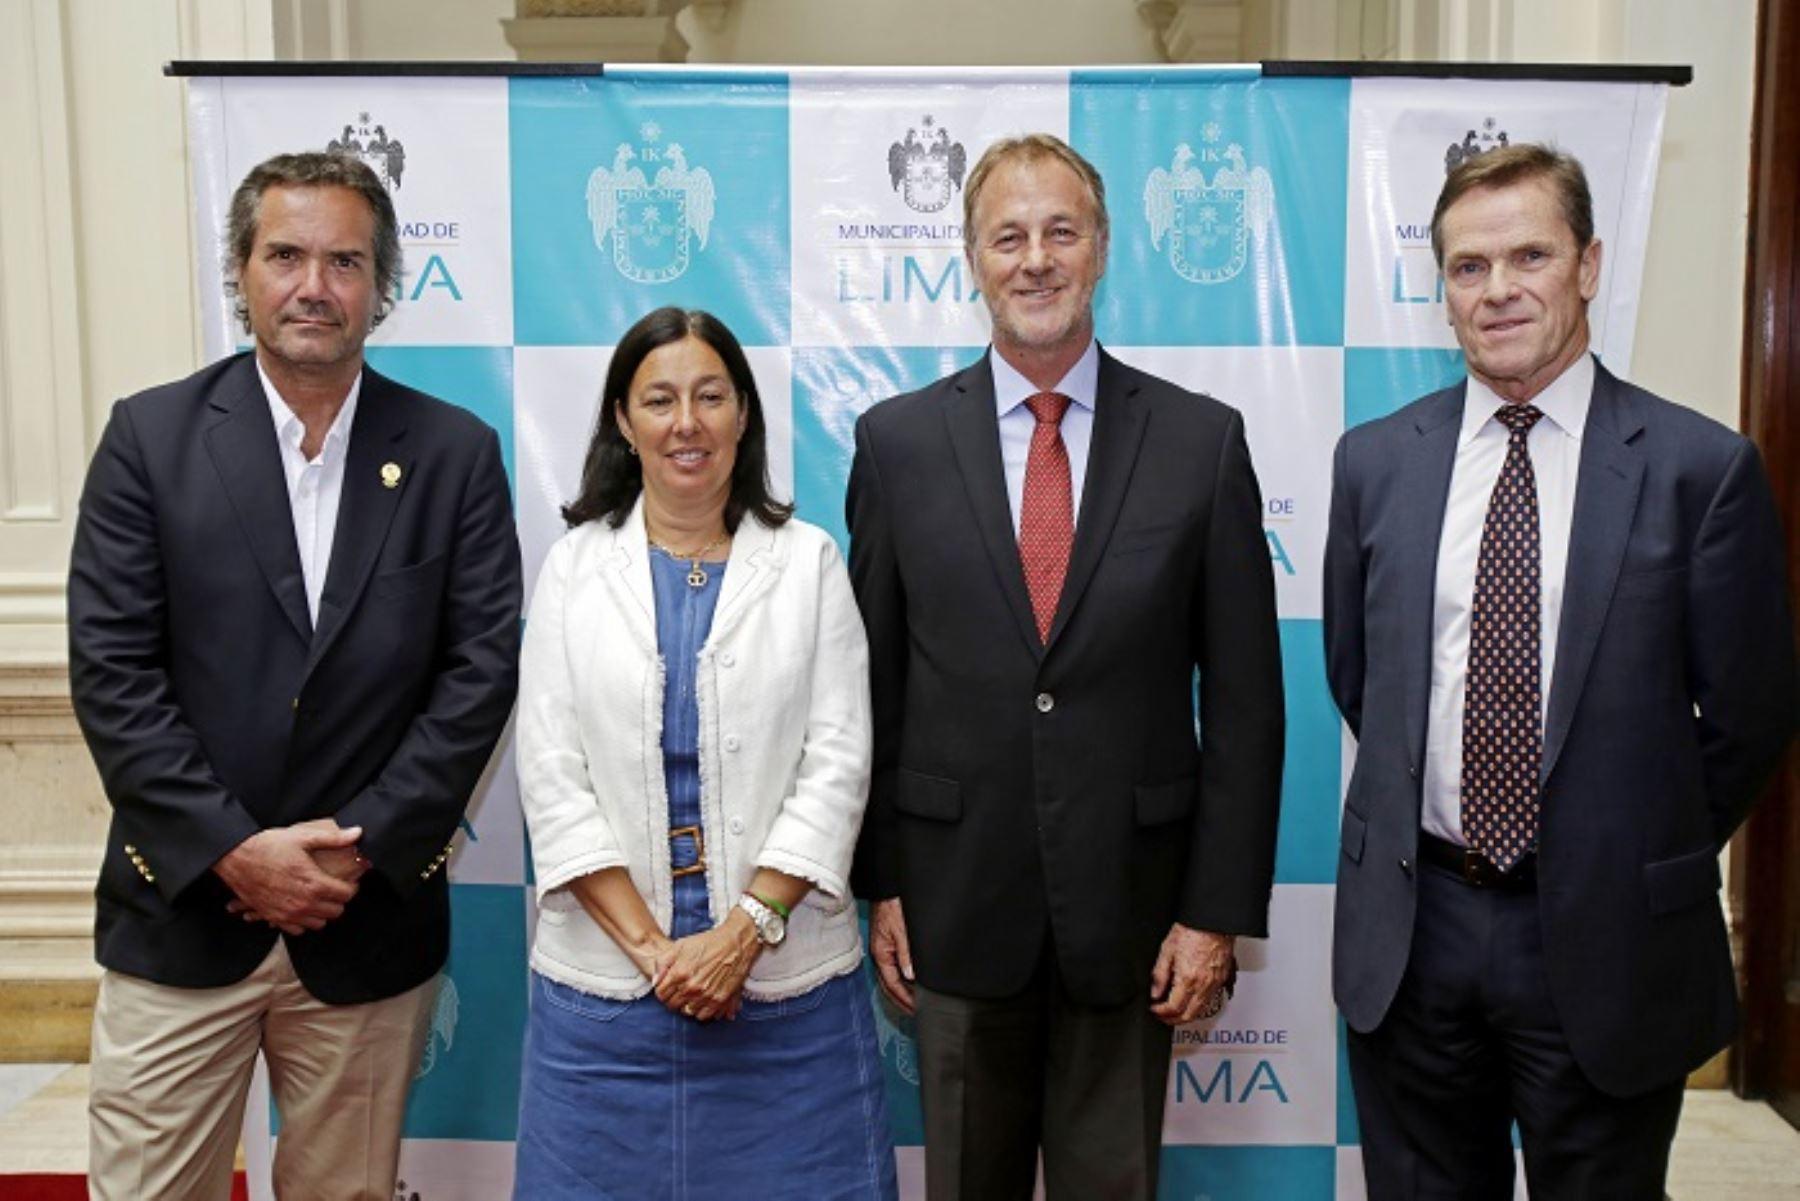 Ministra del Deporte de Chile, Pauline Kantor, visitó al alcalde de Lima, Jorge Muñoz; al presidente del Comité Organizador de Lima 2019 (Copal), Carlos Neuhaus, y al presidente de Panam Sport, Neven Ilic,